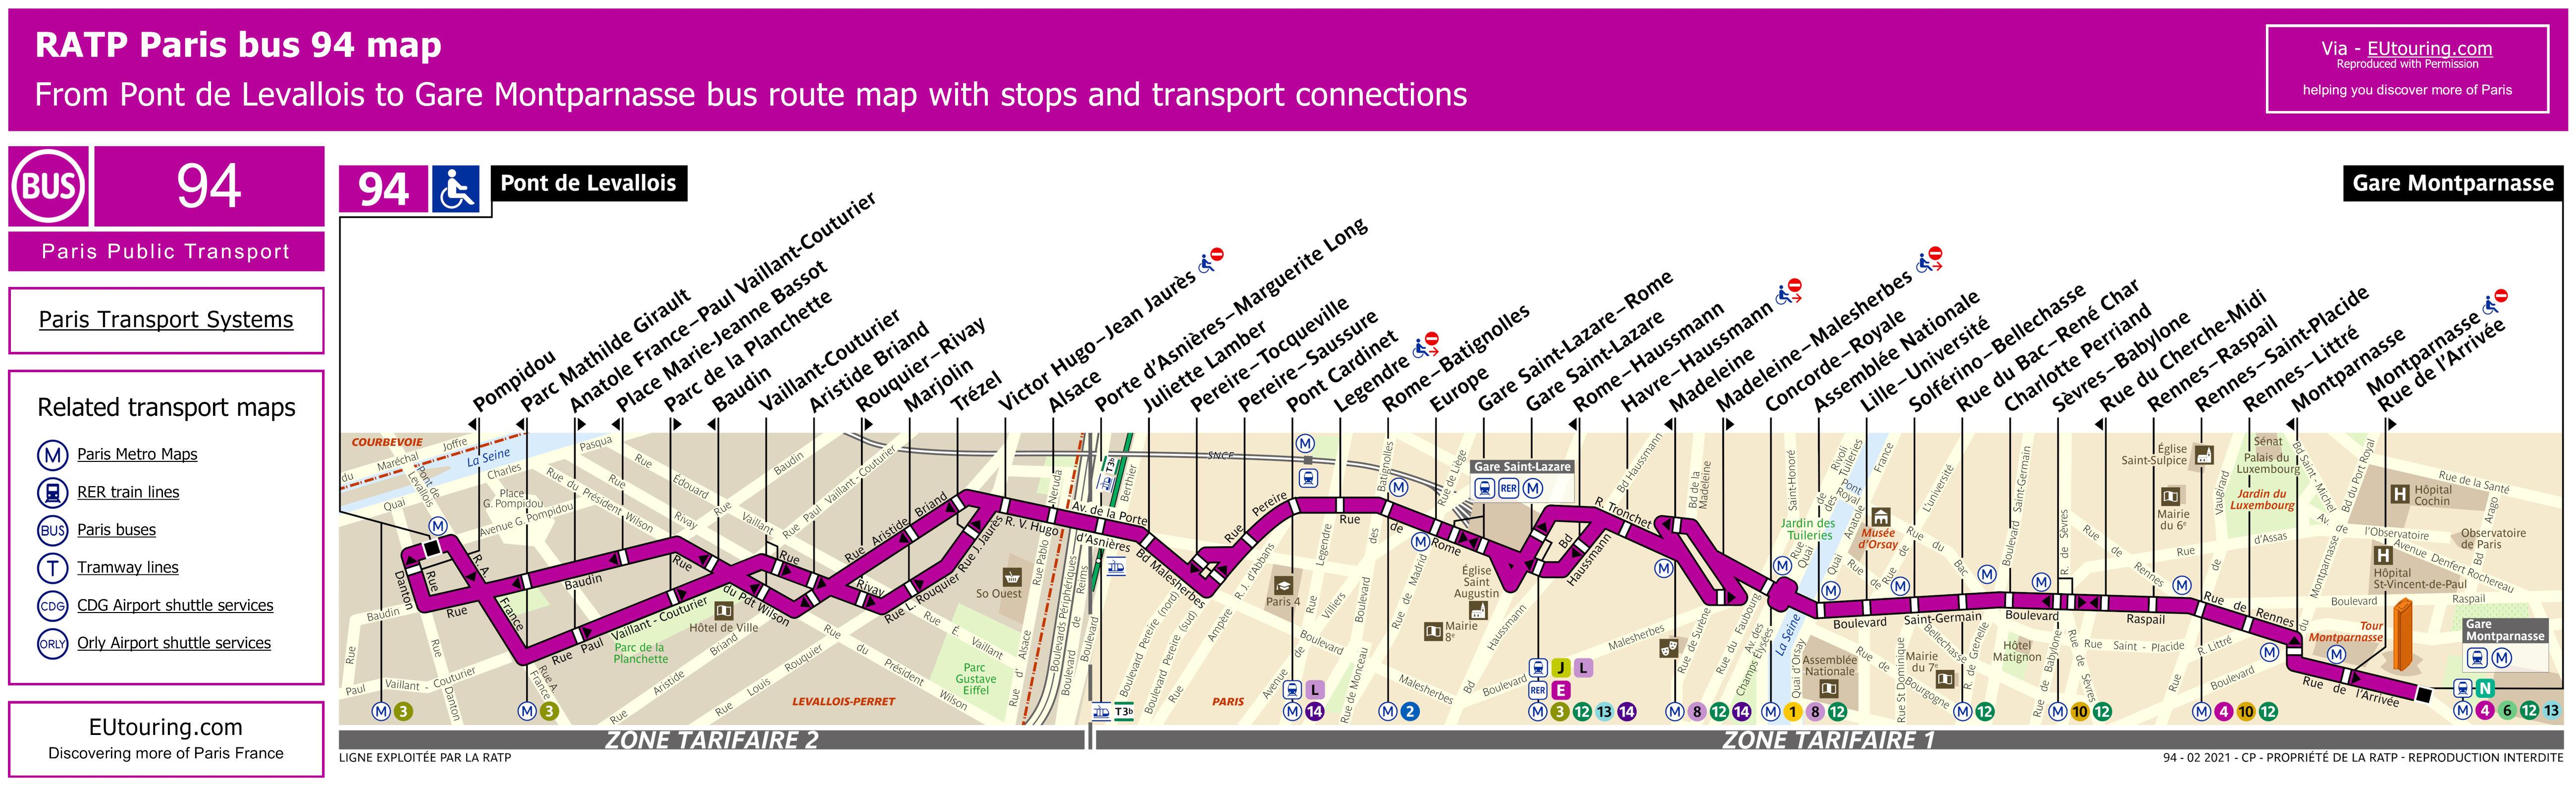 RATP Route Maps For Paris Bus Lines Through To - Paris bus route map in english